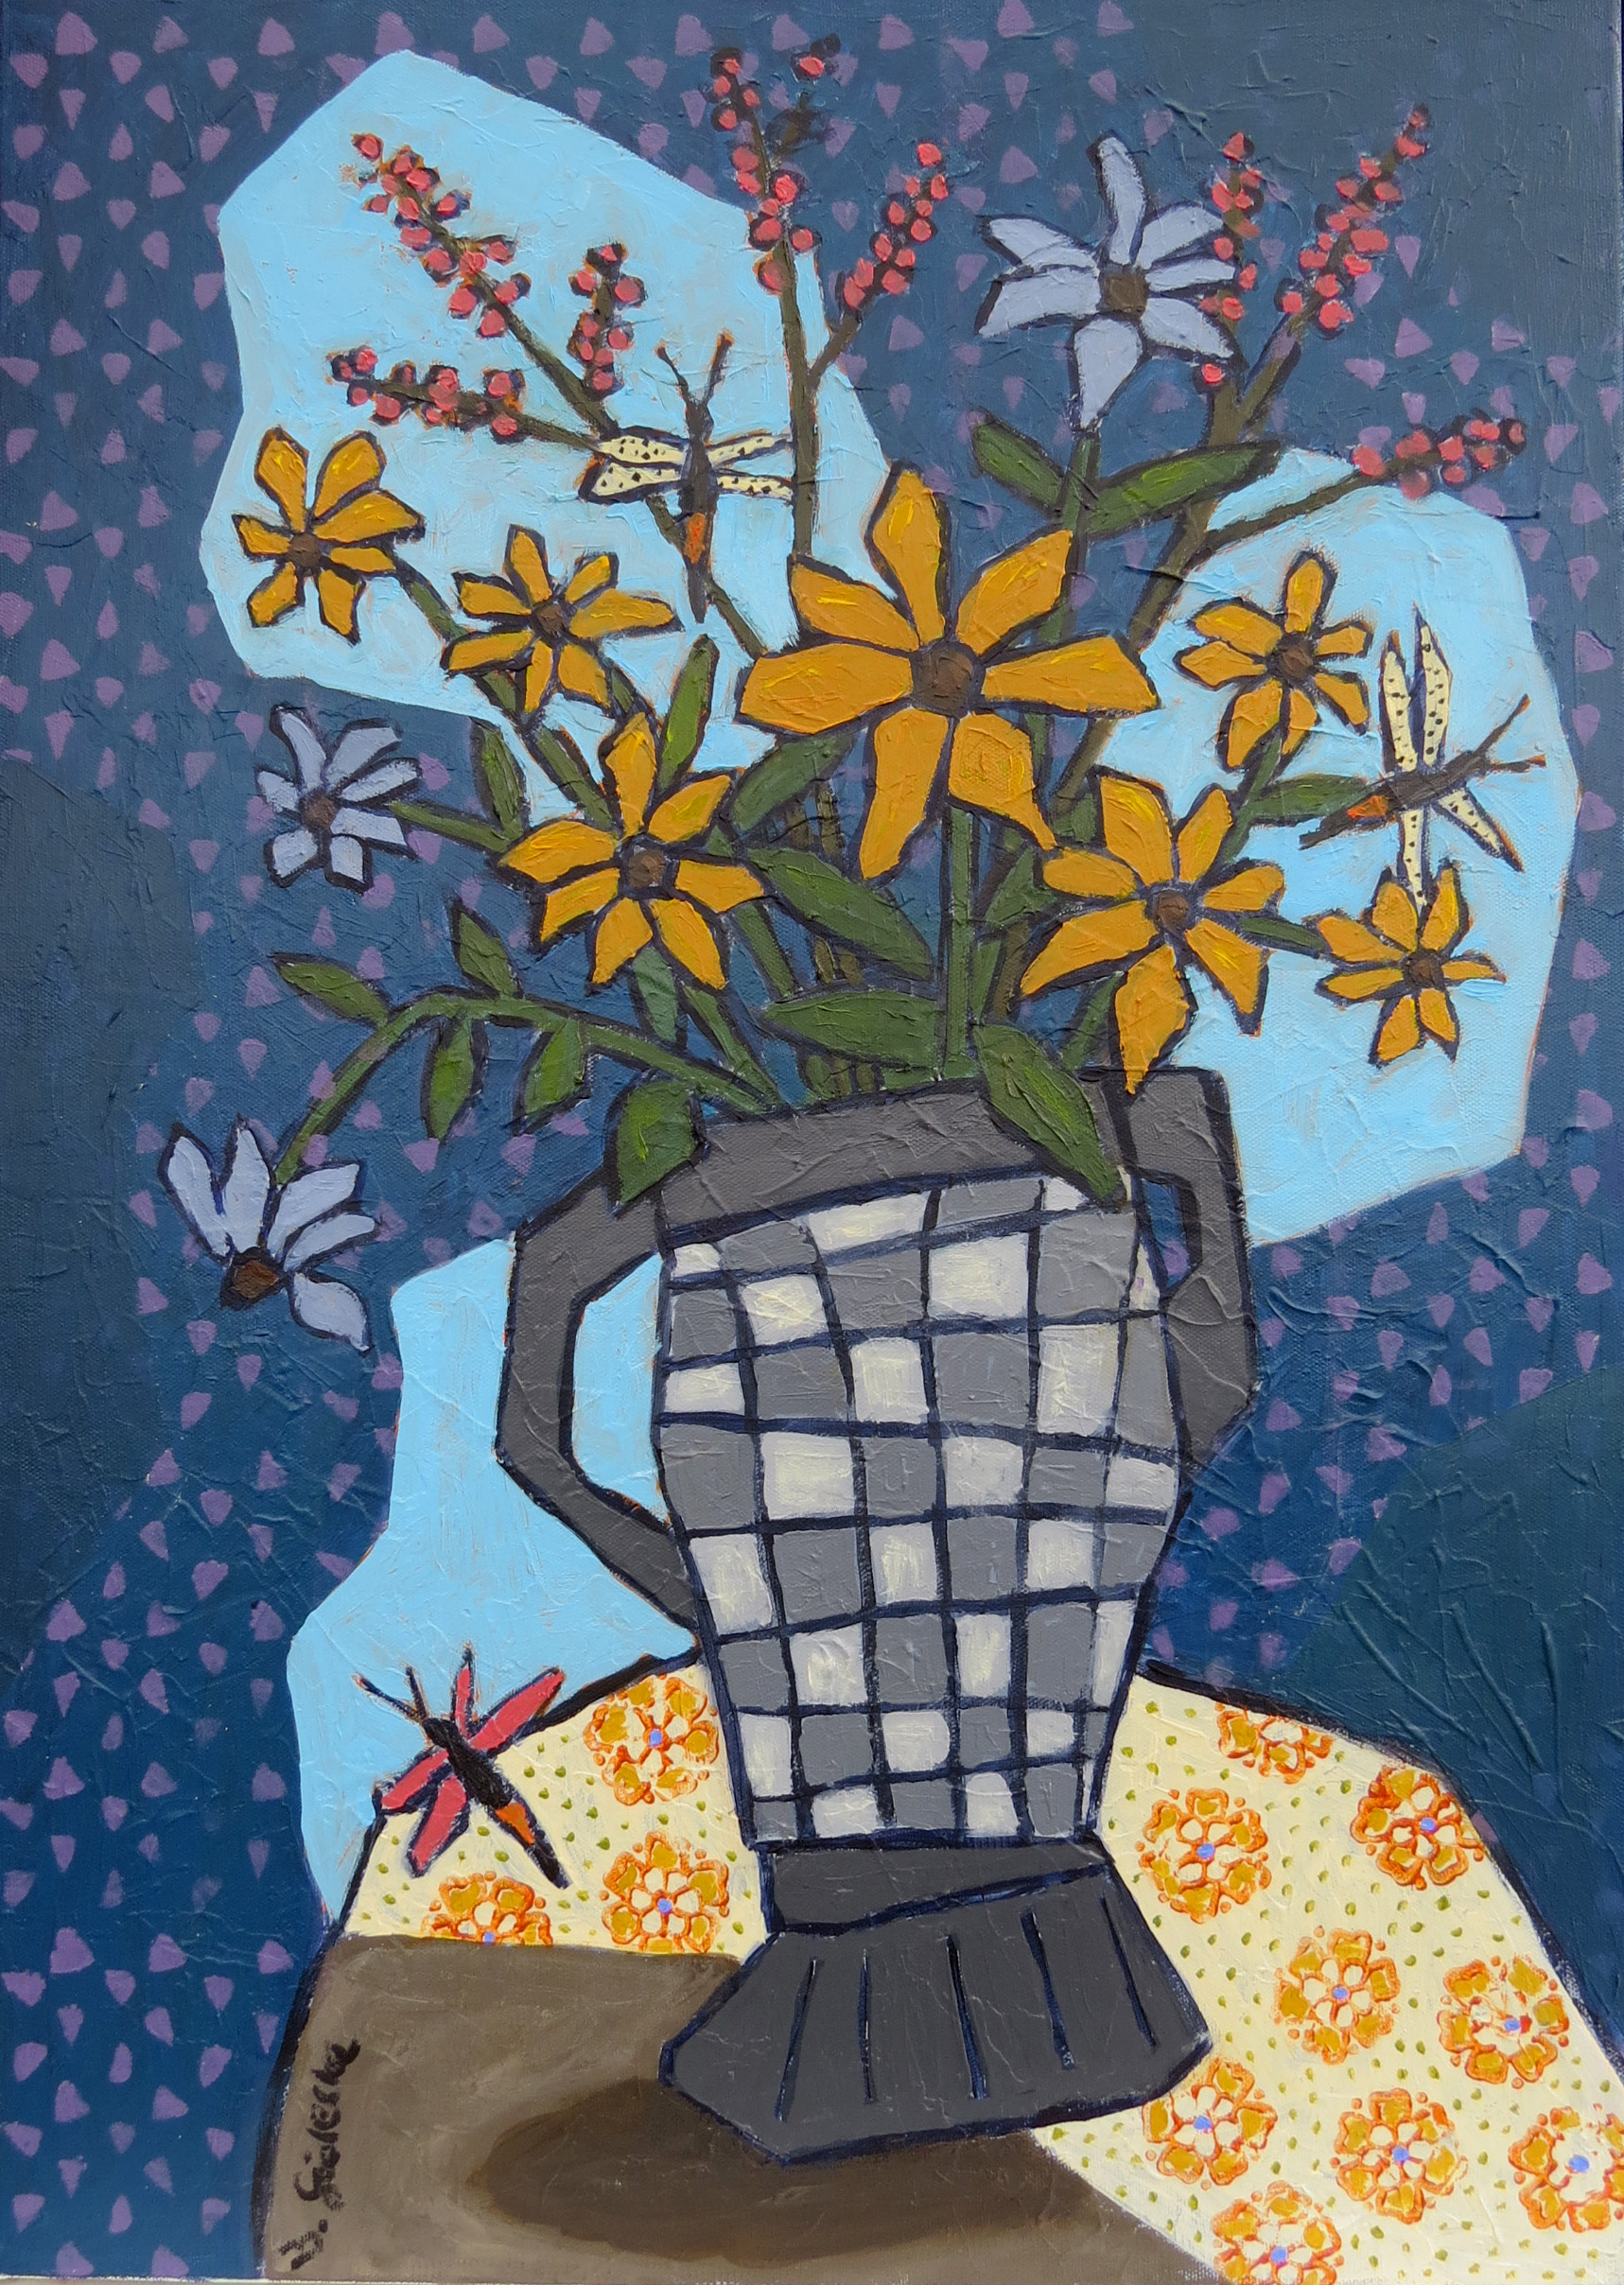 """Vase mit Sonnenhut"" 2019, 70 x 50 cm, Acryl/Öl, Leinwand, gerahmt"